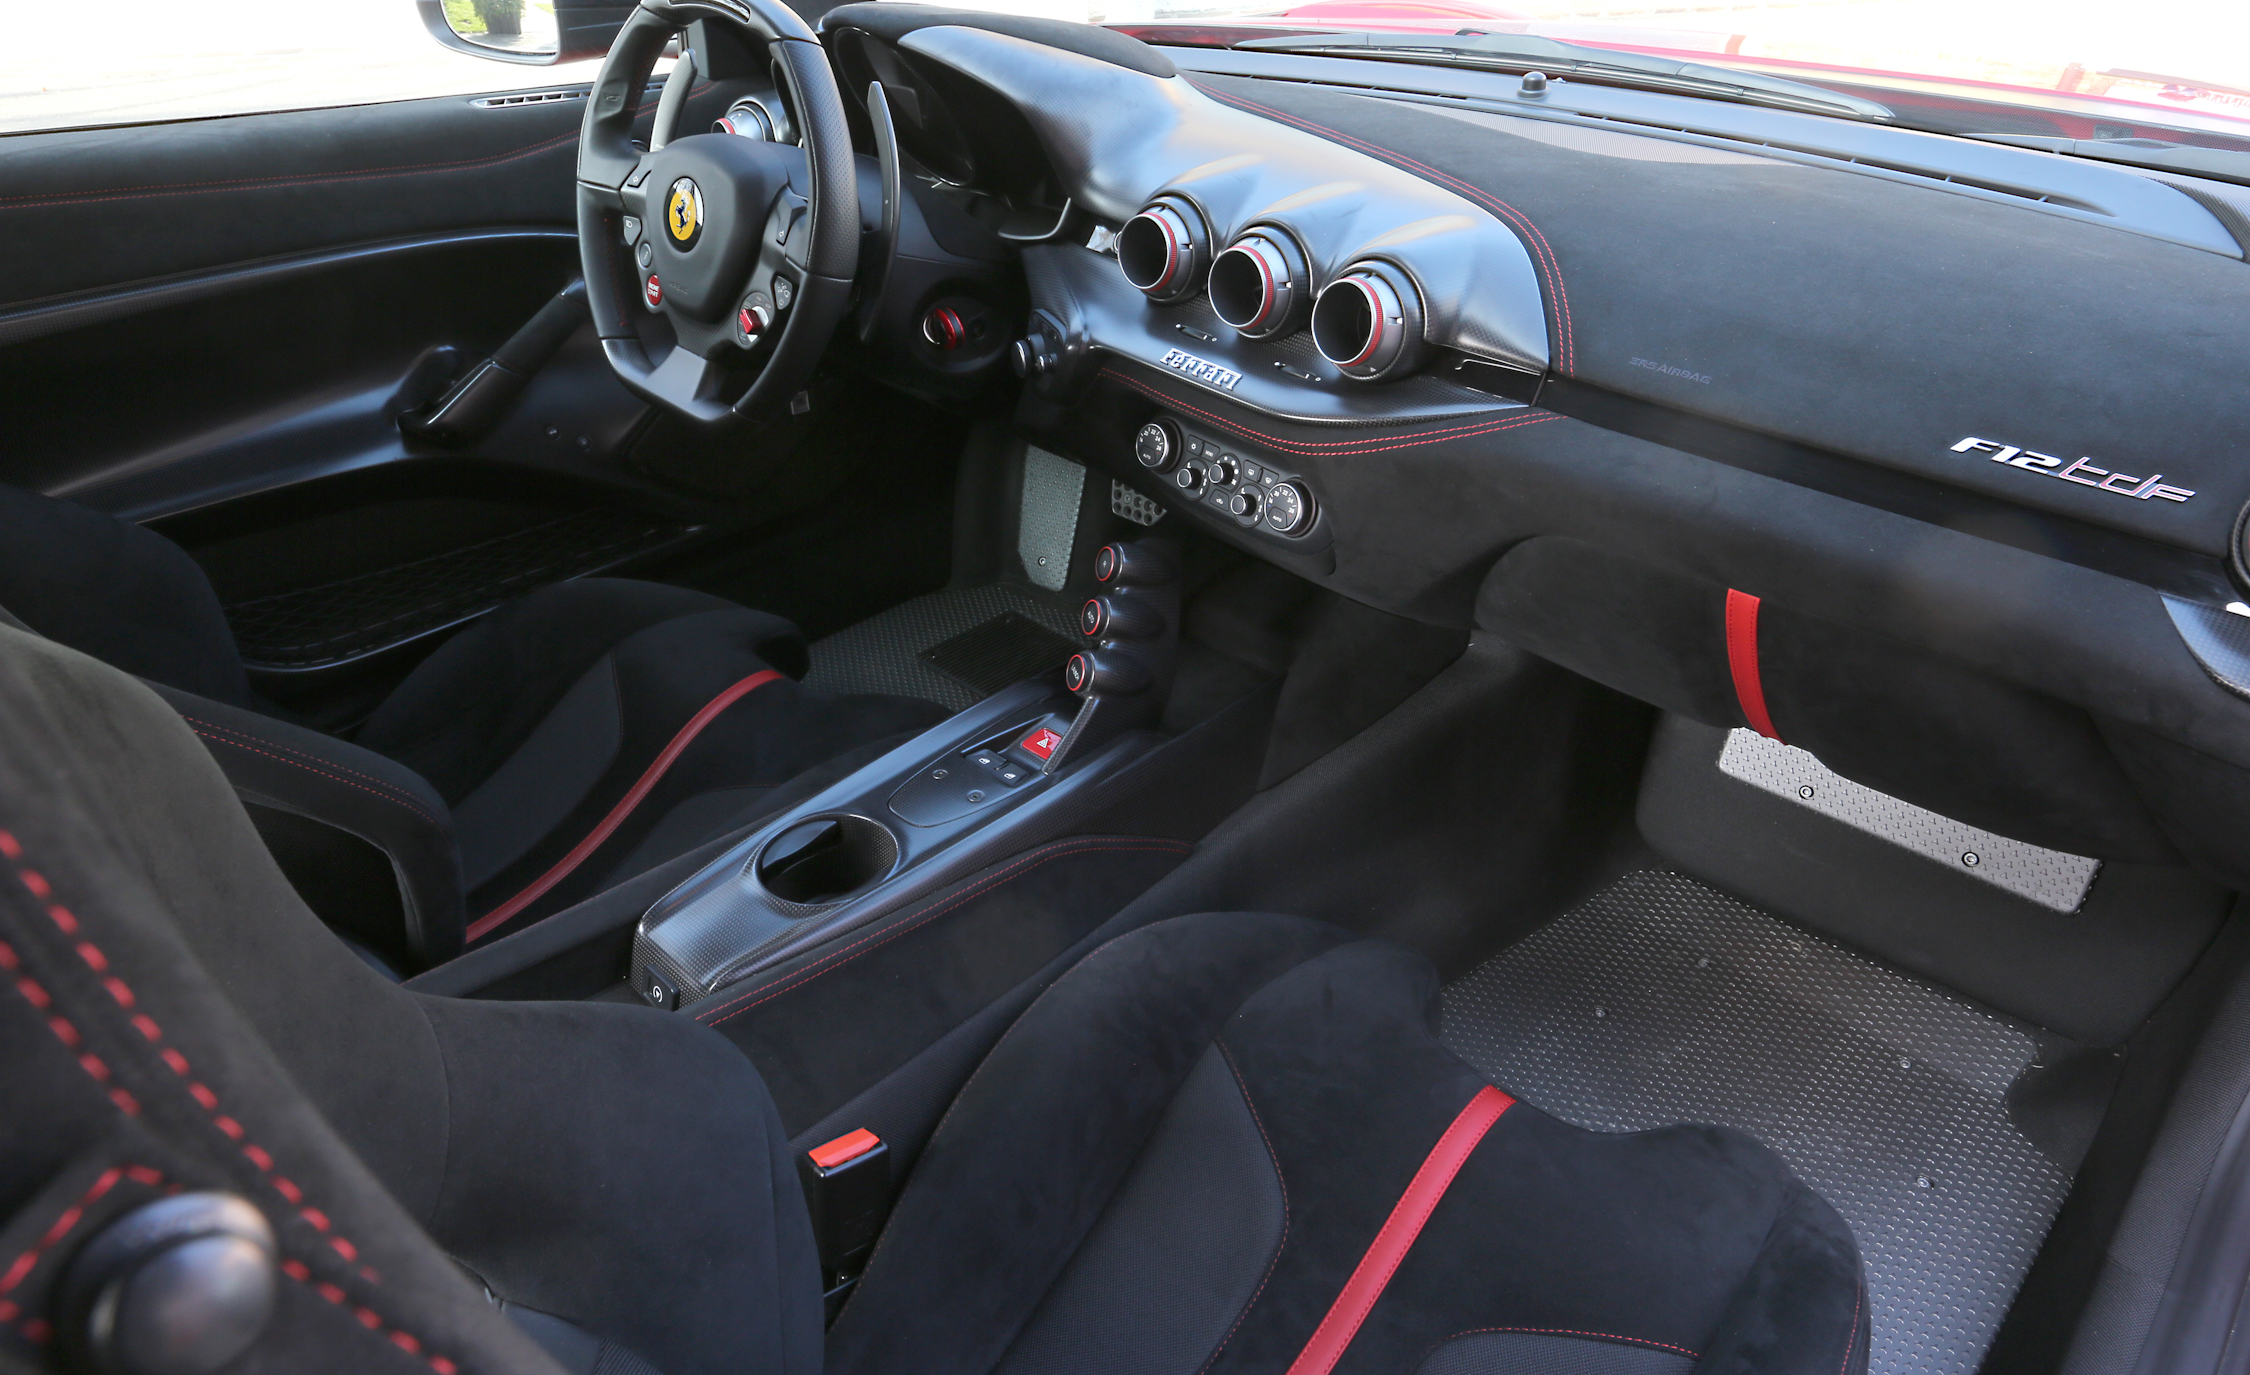 2016 Ferrari F12tdf Dashboard Interior